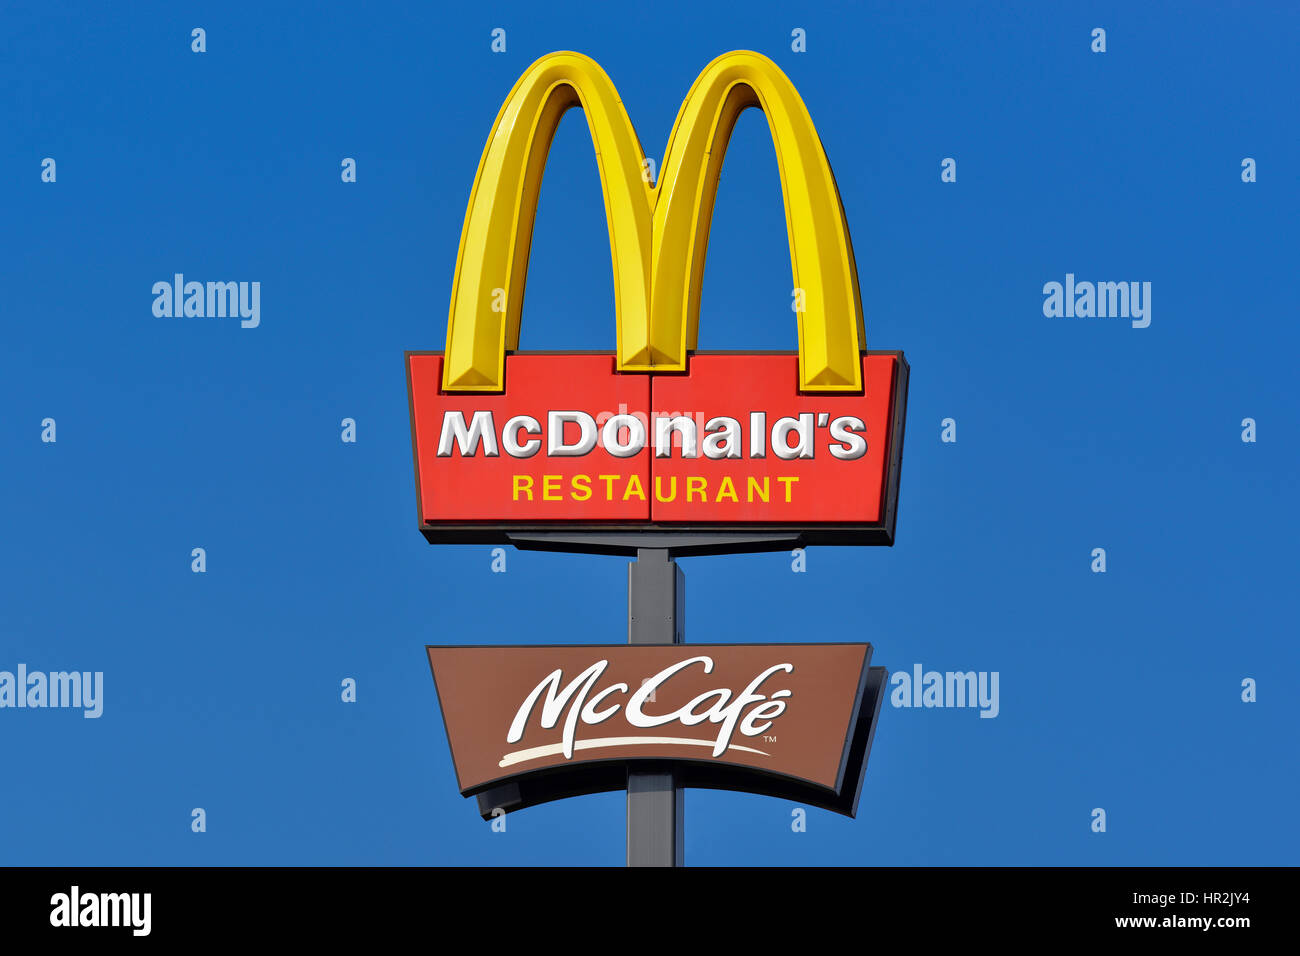 McDonalds Sign - Stock Image